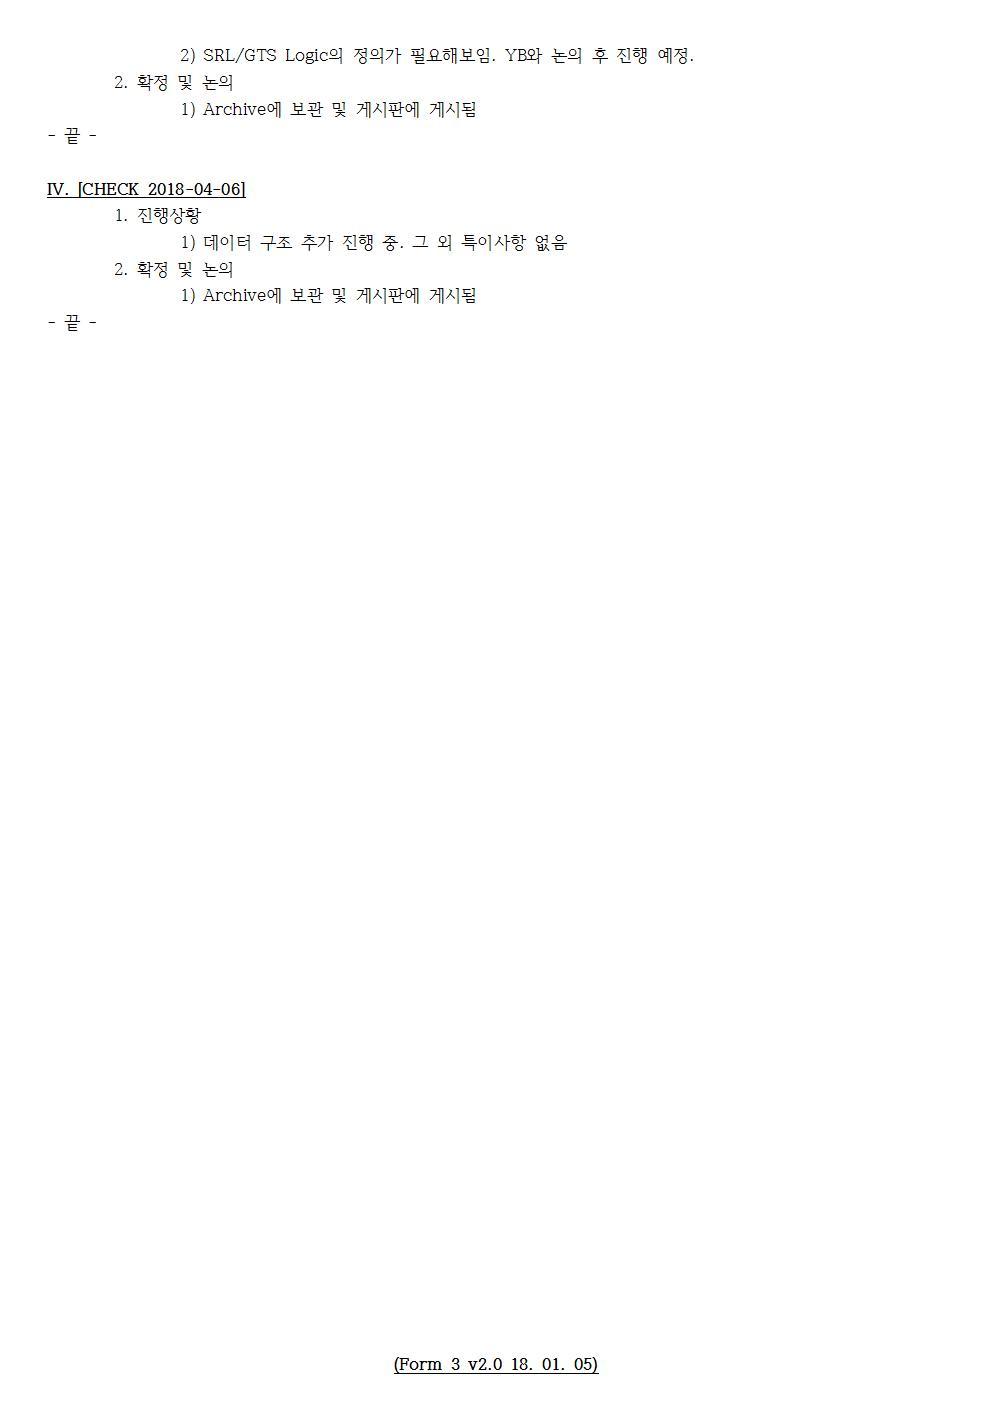 D-[18-001-RD-01]-[SAVE 3.0]-[2018-04-06][SH]002.jpg